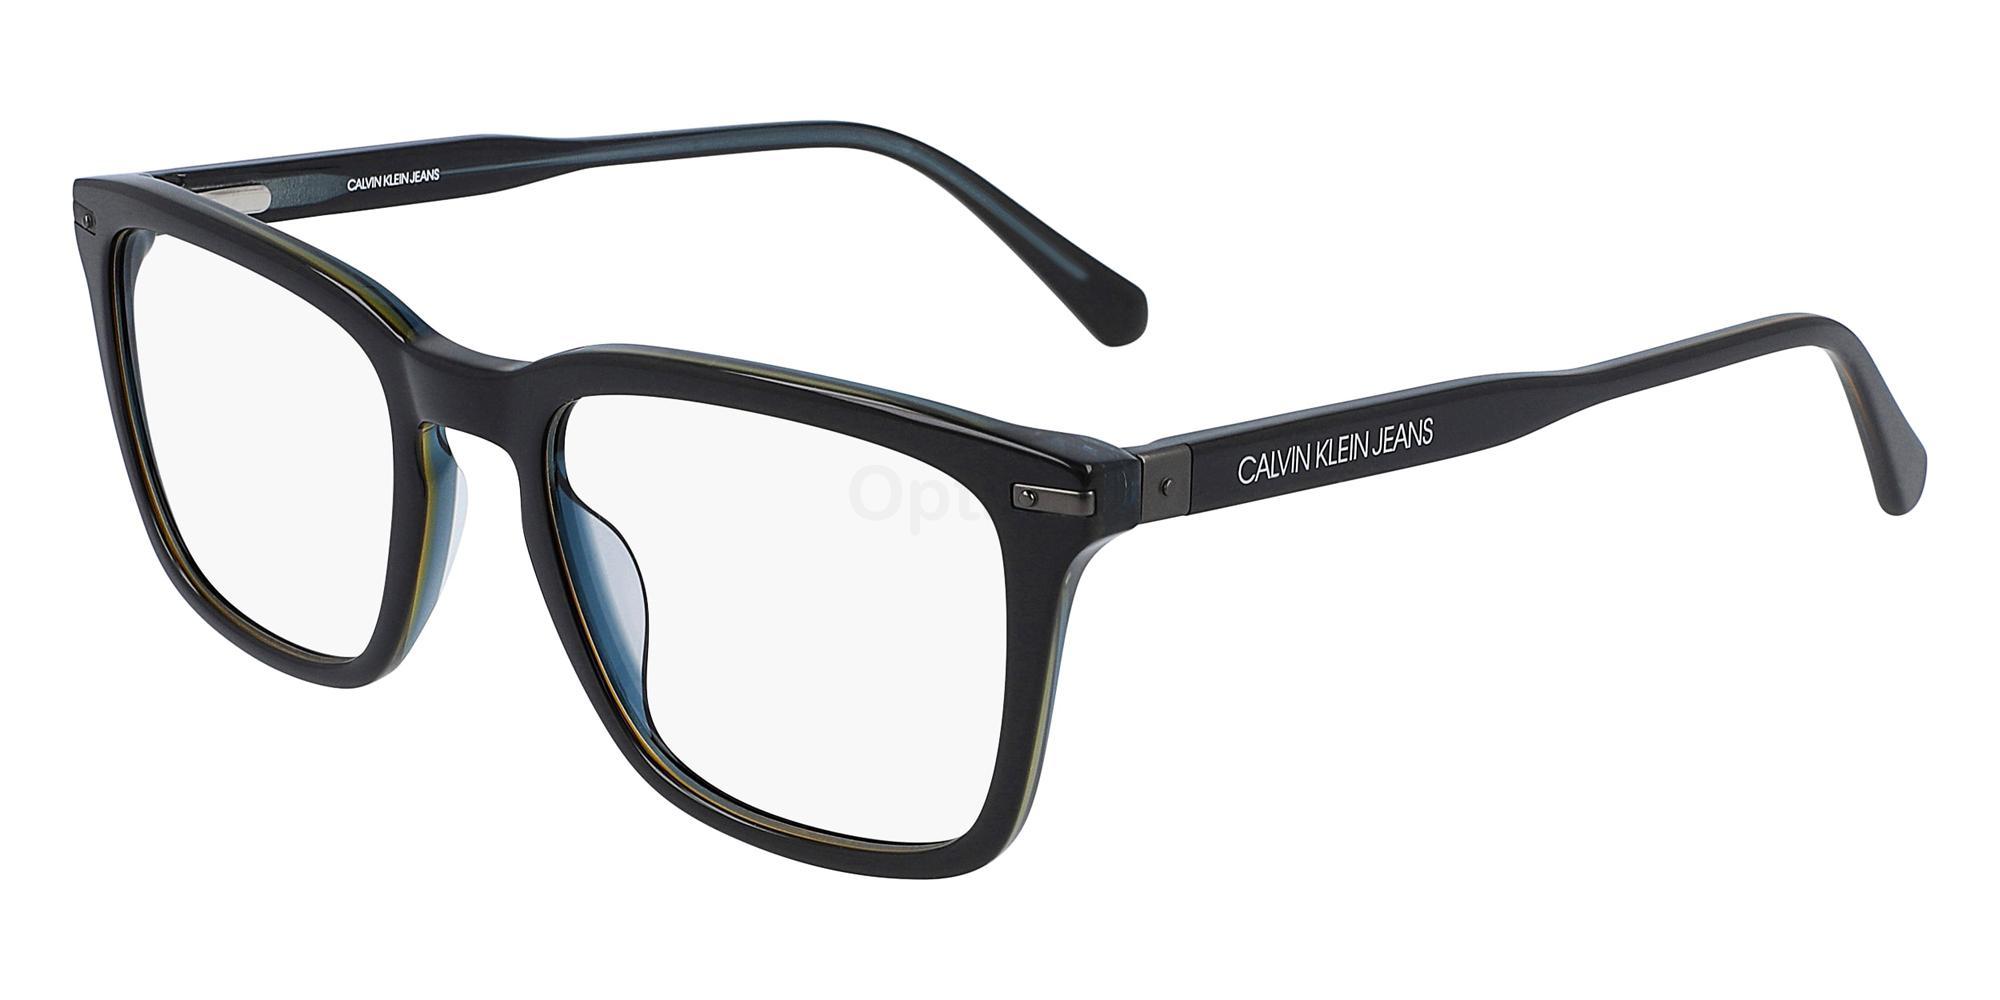 077 CKJ20512 Glasses, Calvin Klein Jeans